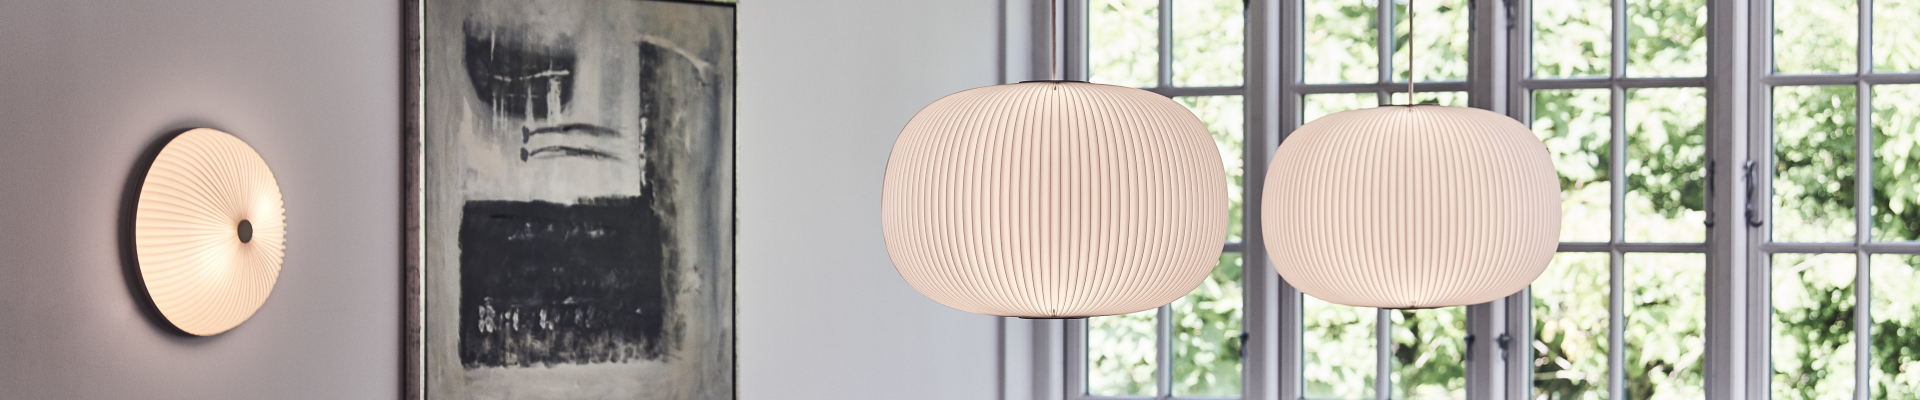 LE KLINT wandlampen